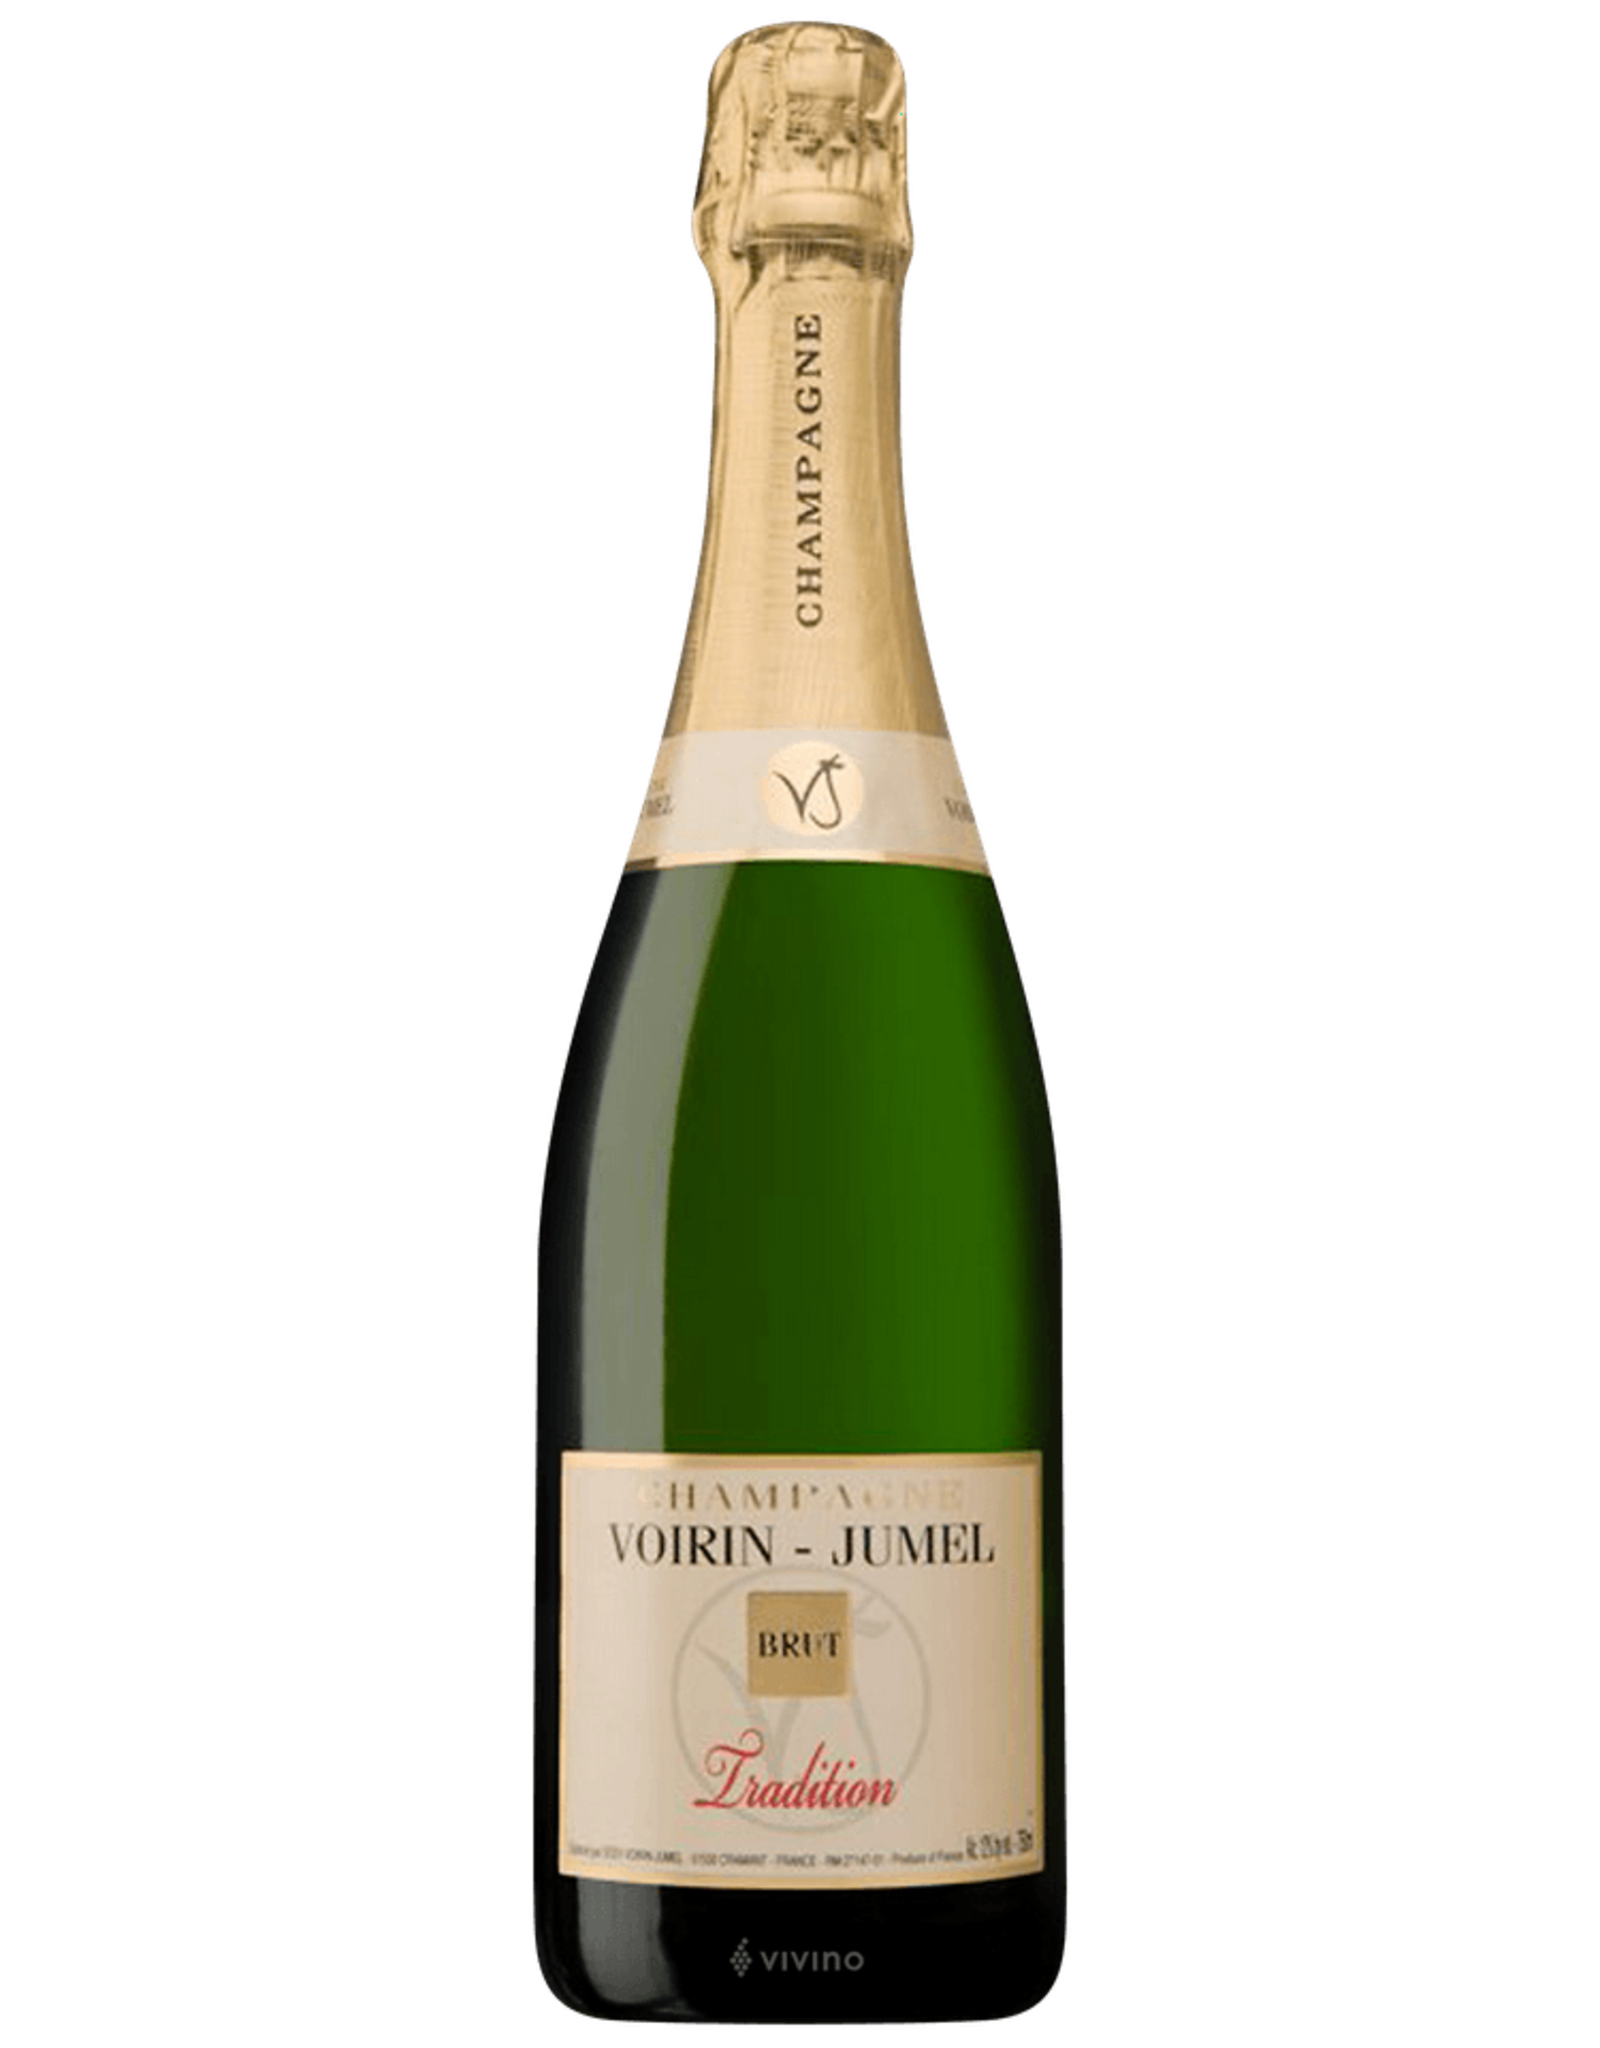 Voirin Jumel Tradition Blanc de Blancs Champagne